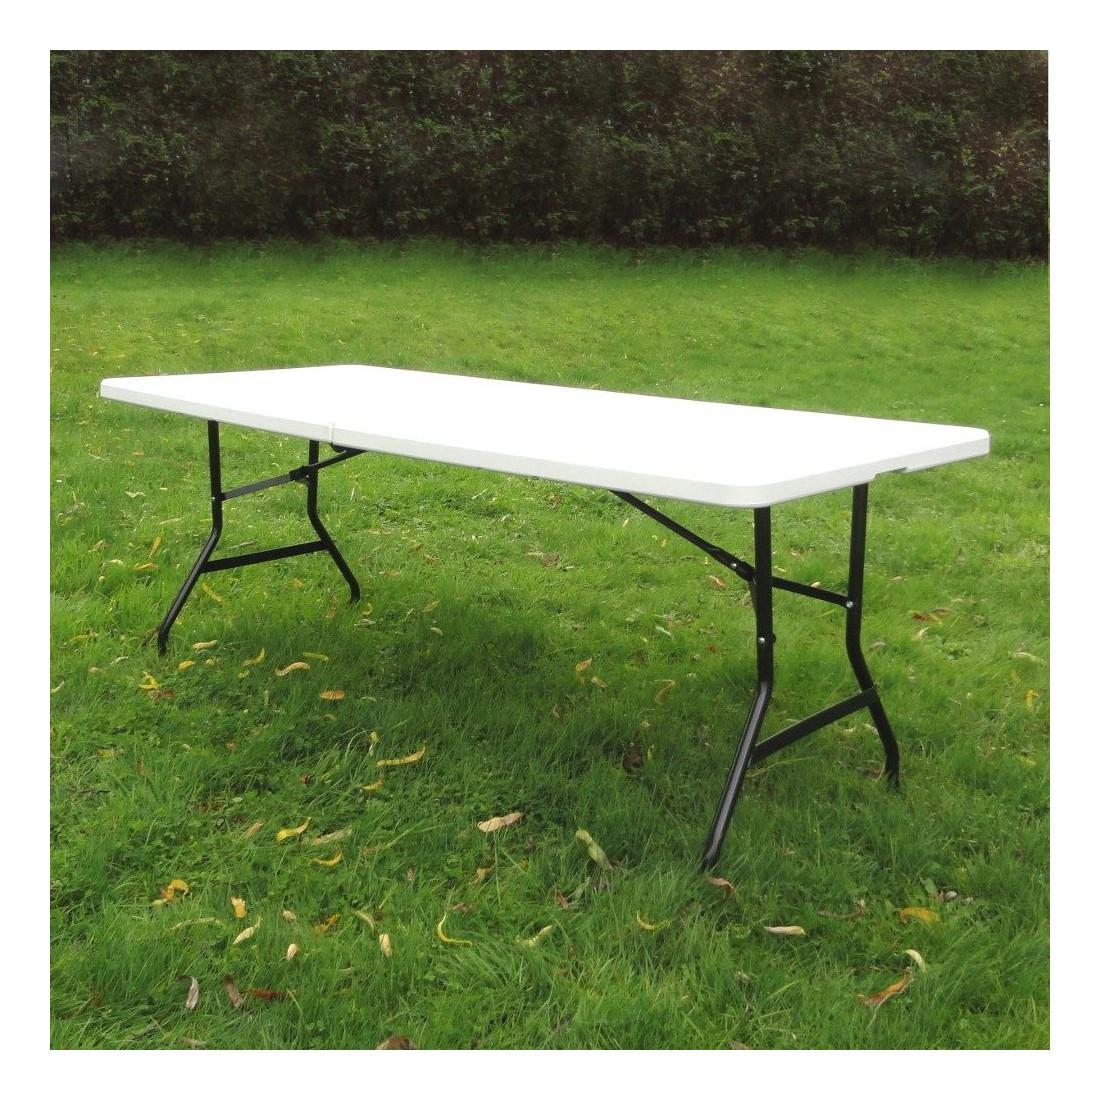 Table pliante rectangulaire 183cm blanche pliante en - Table haute pliante rectangulaire ...